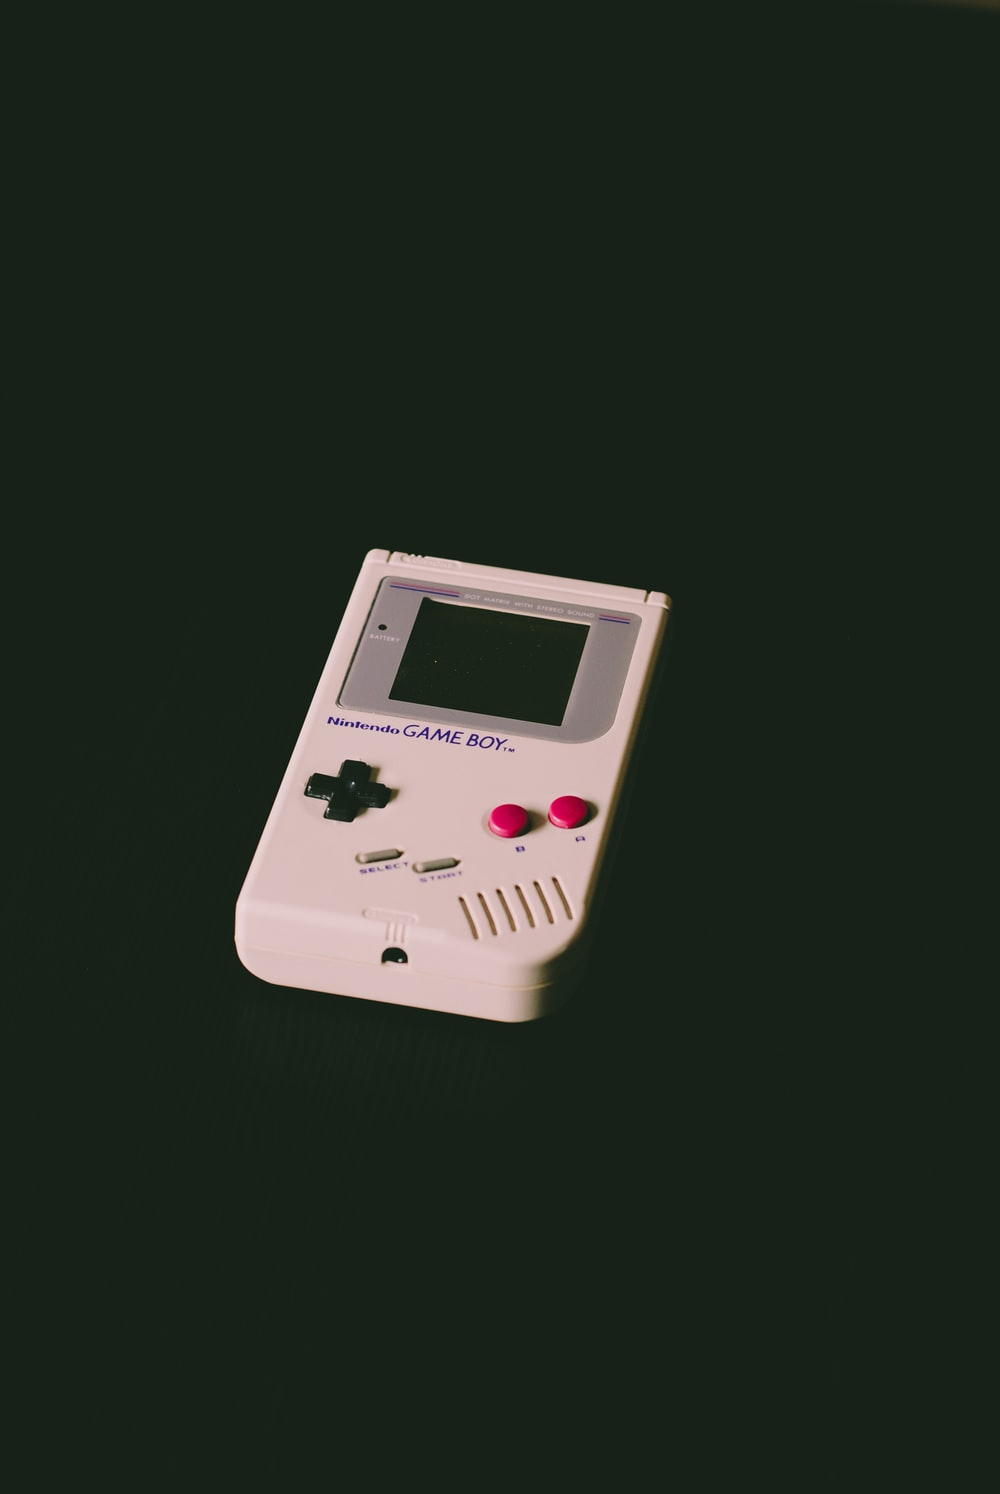 turned off Nintendo Game Boy